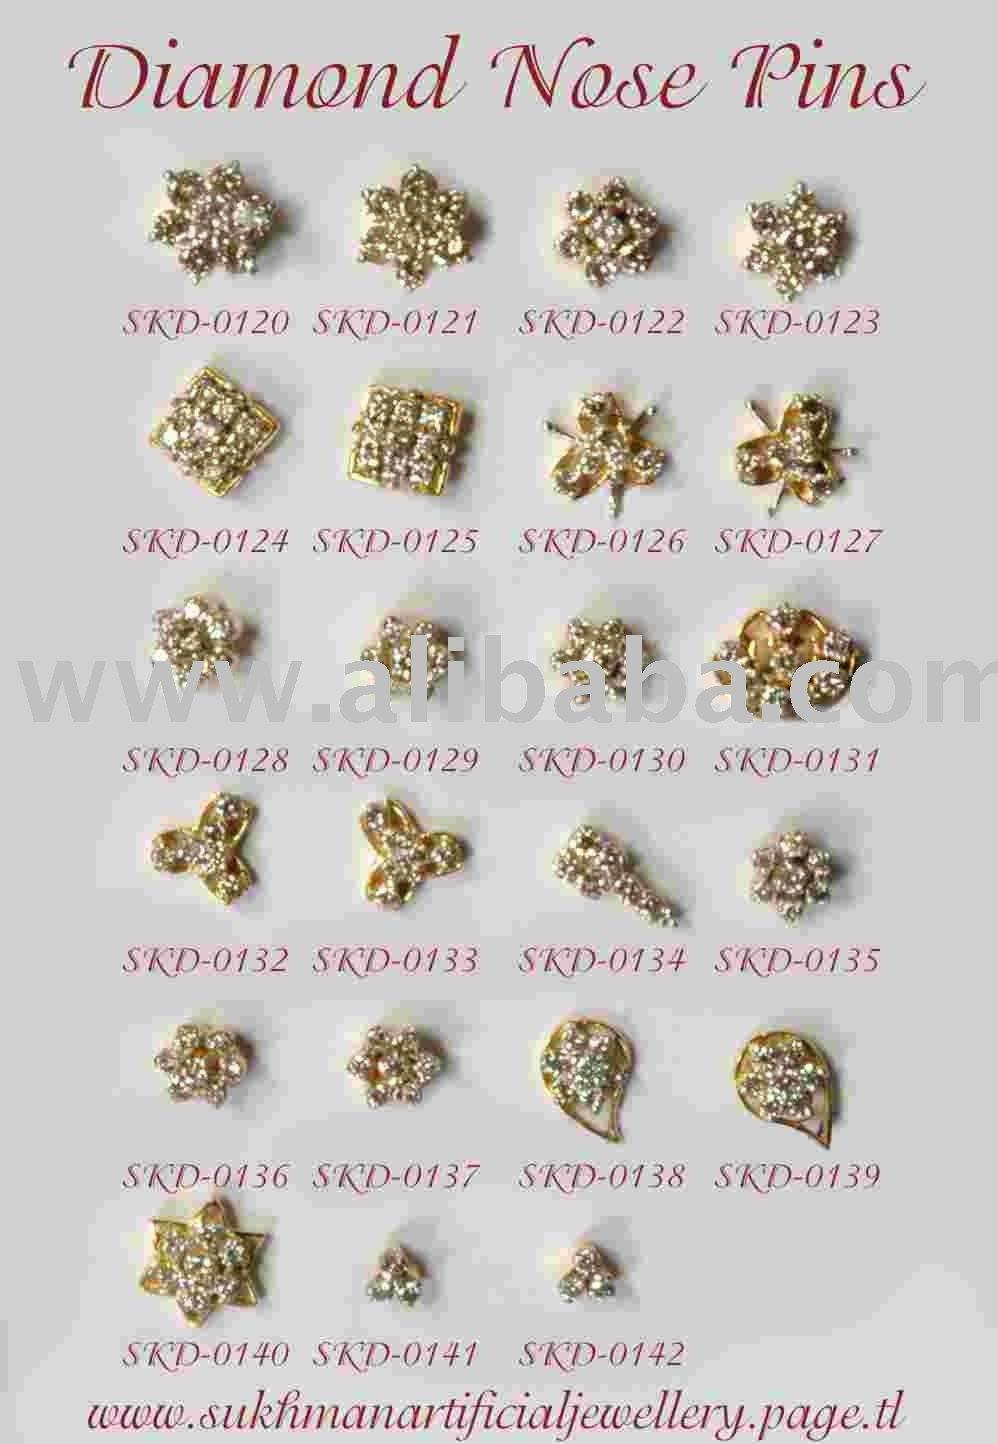 Nose Pins Diamond Buy Diamond Nose Pins Product On Alibaba